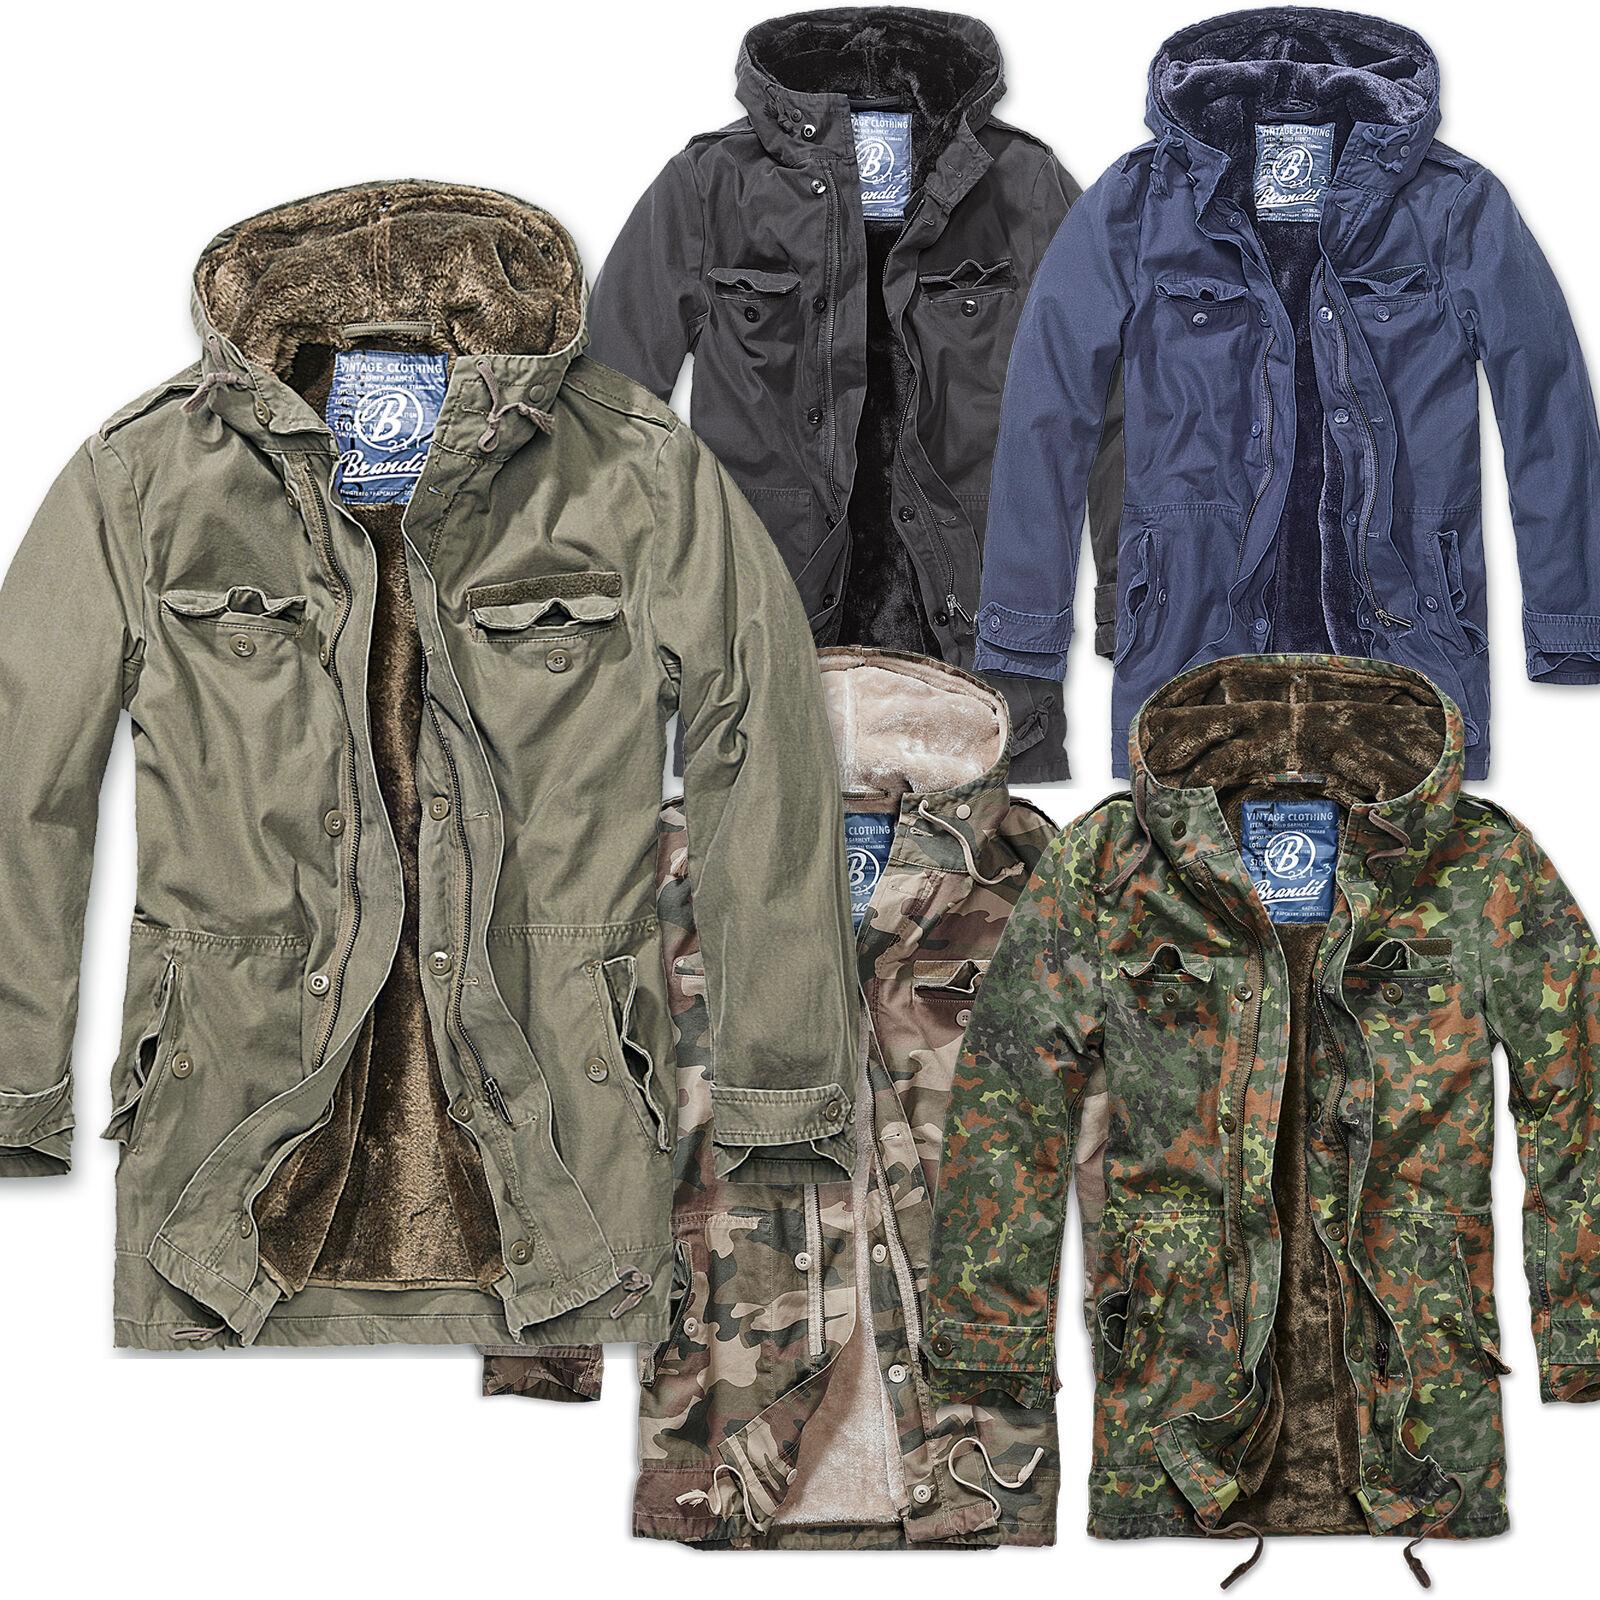 Details about Brandit Bw Parka Mens Jacket Autumn Winter Winter Jacket Army Bundeswehr Army show original title